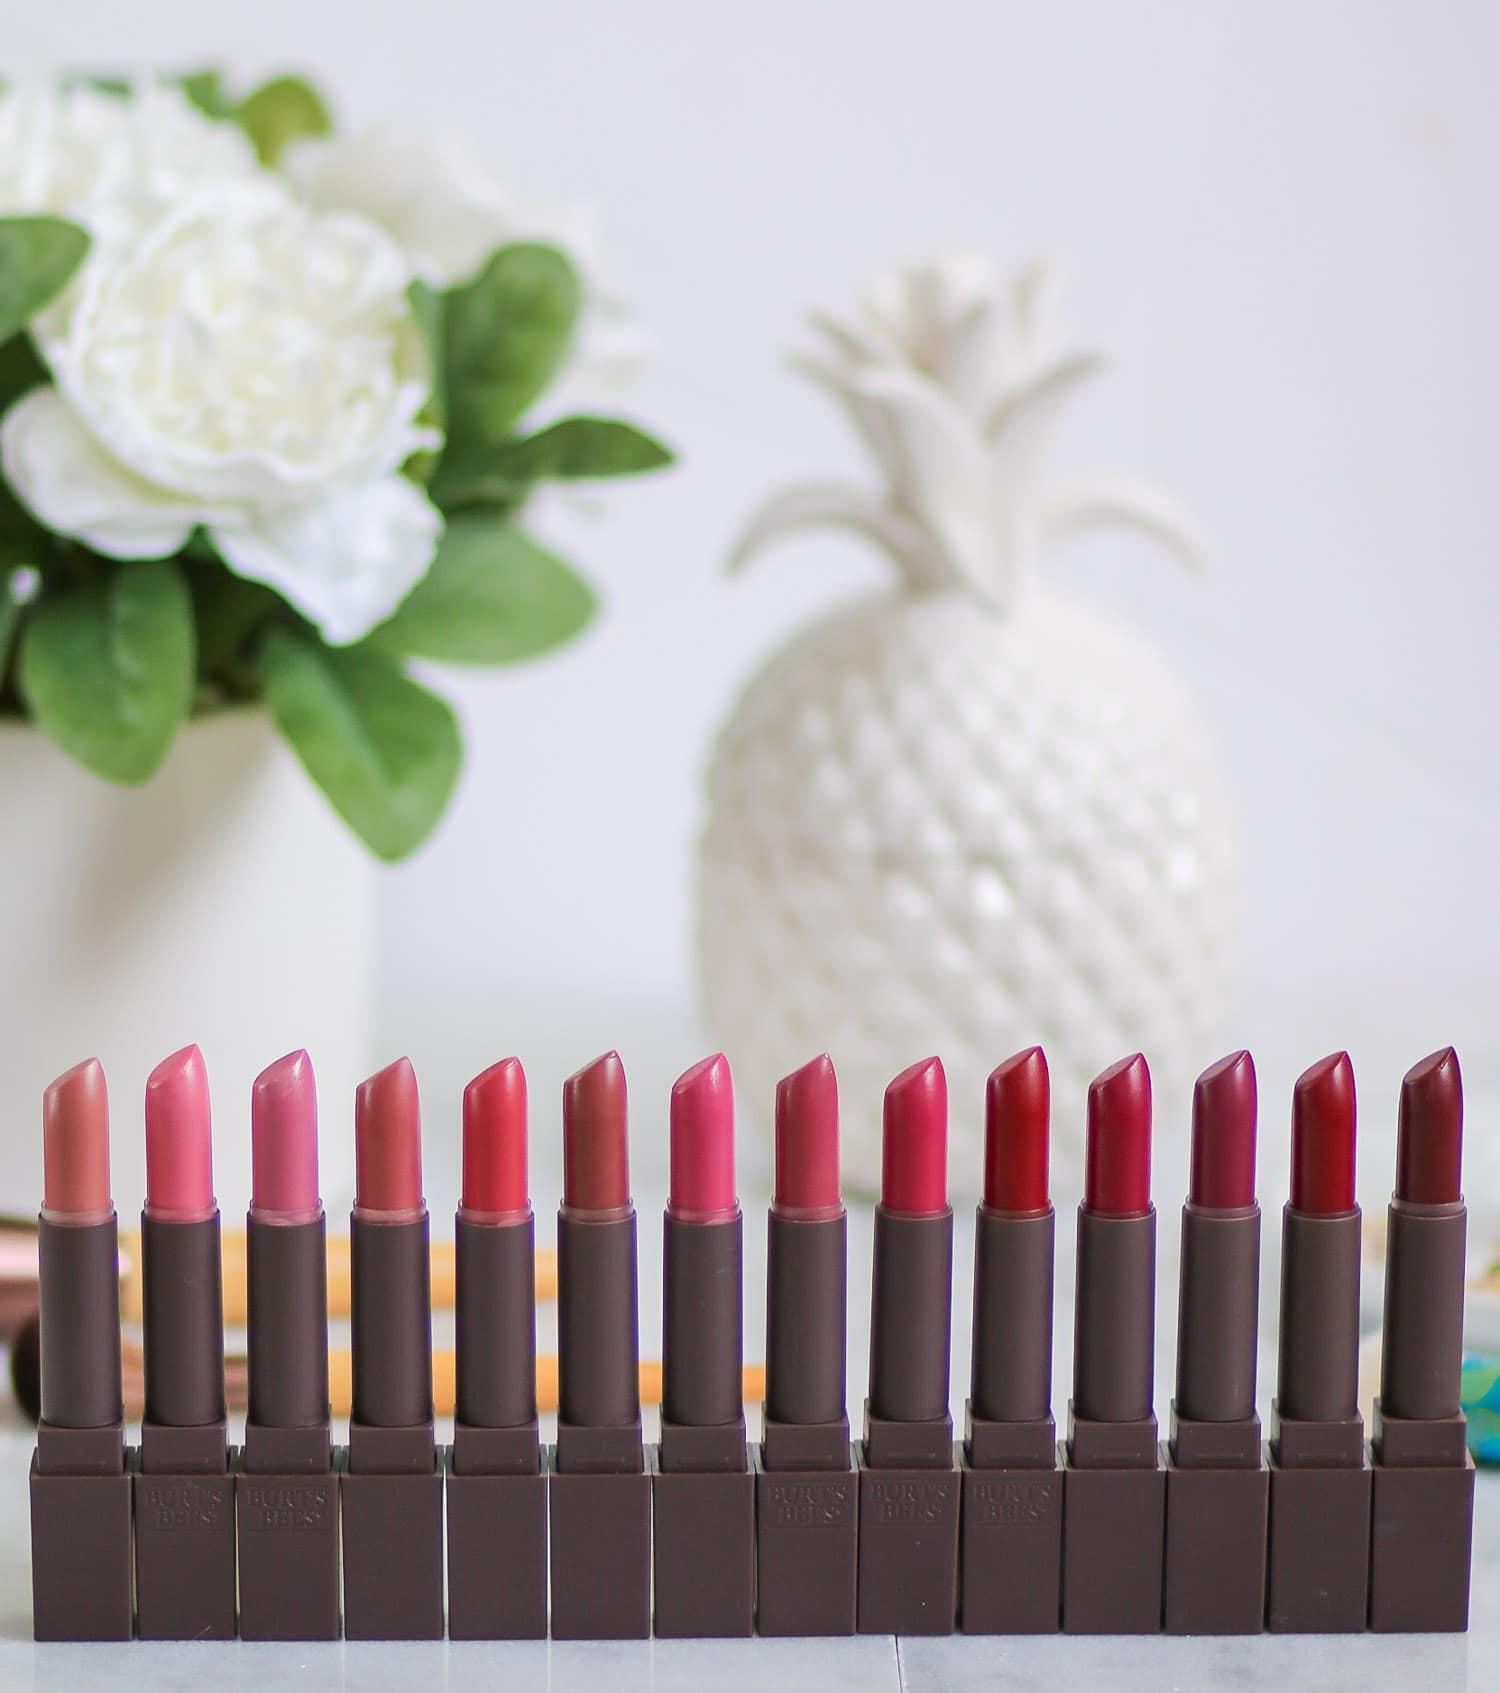 burts-bee-lipsticks-swatches-2106